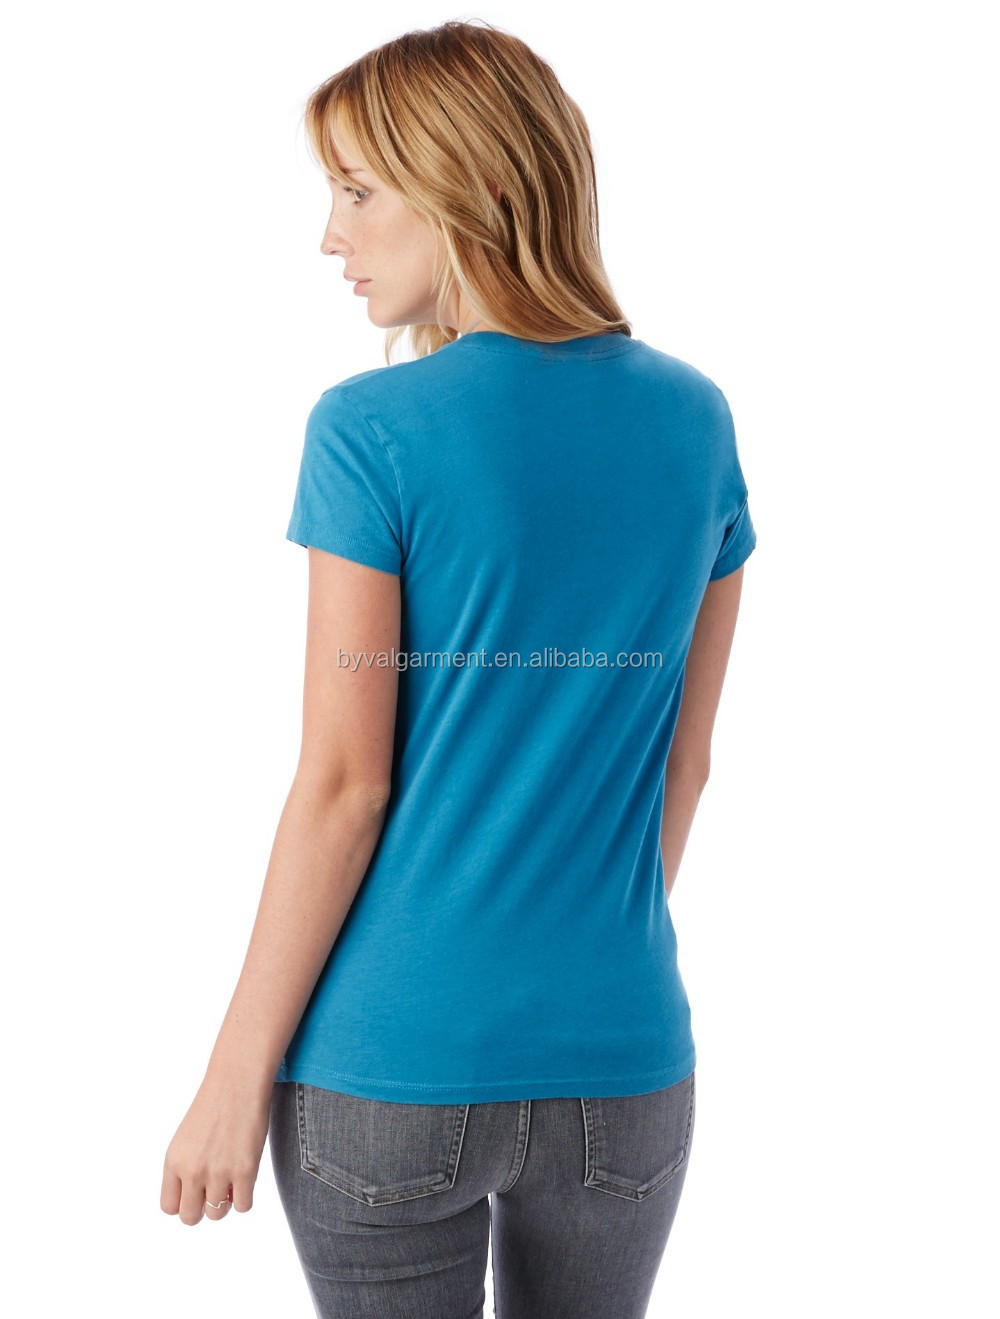 100% organic cotton Bulk plain t-shirts for women (8).jpg